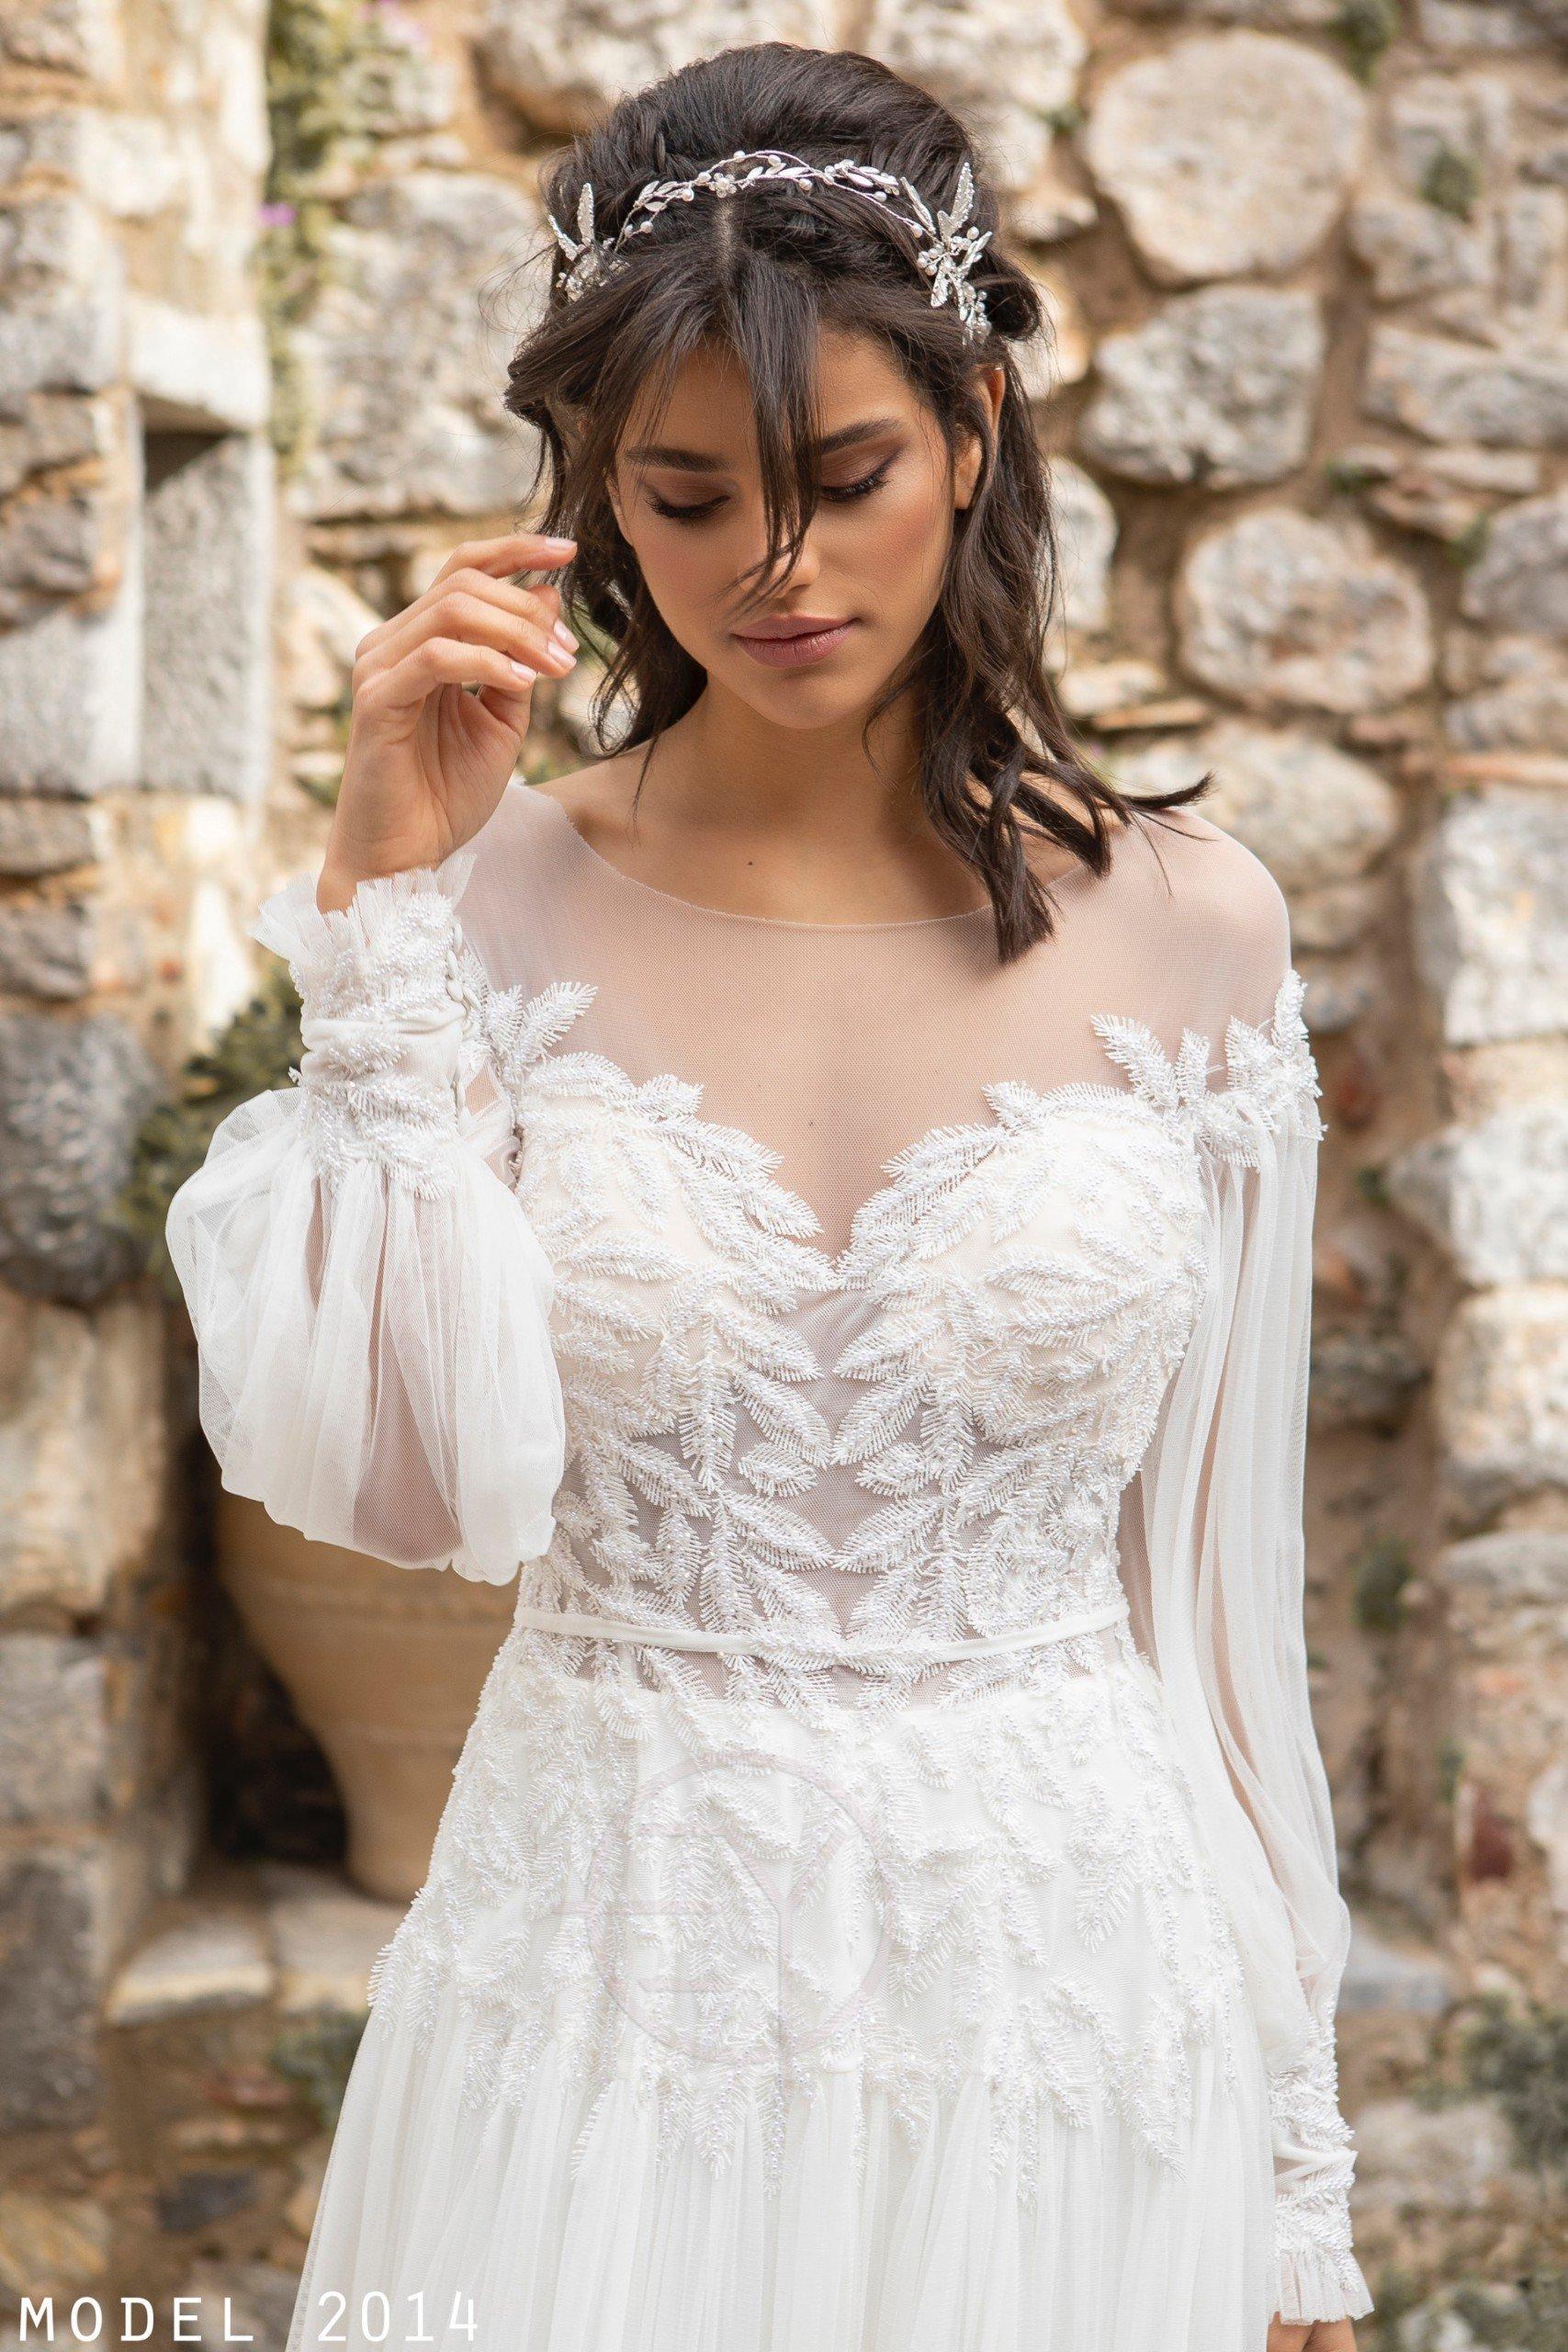 Emine Yildirim Brautkleid Modell 2014